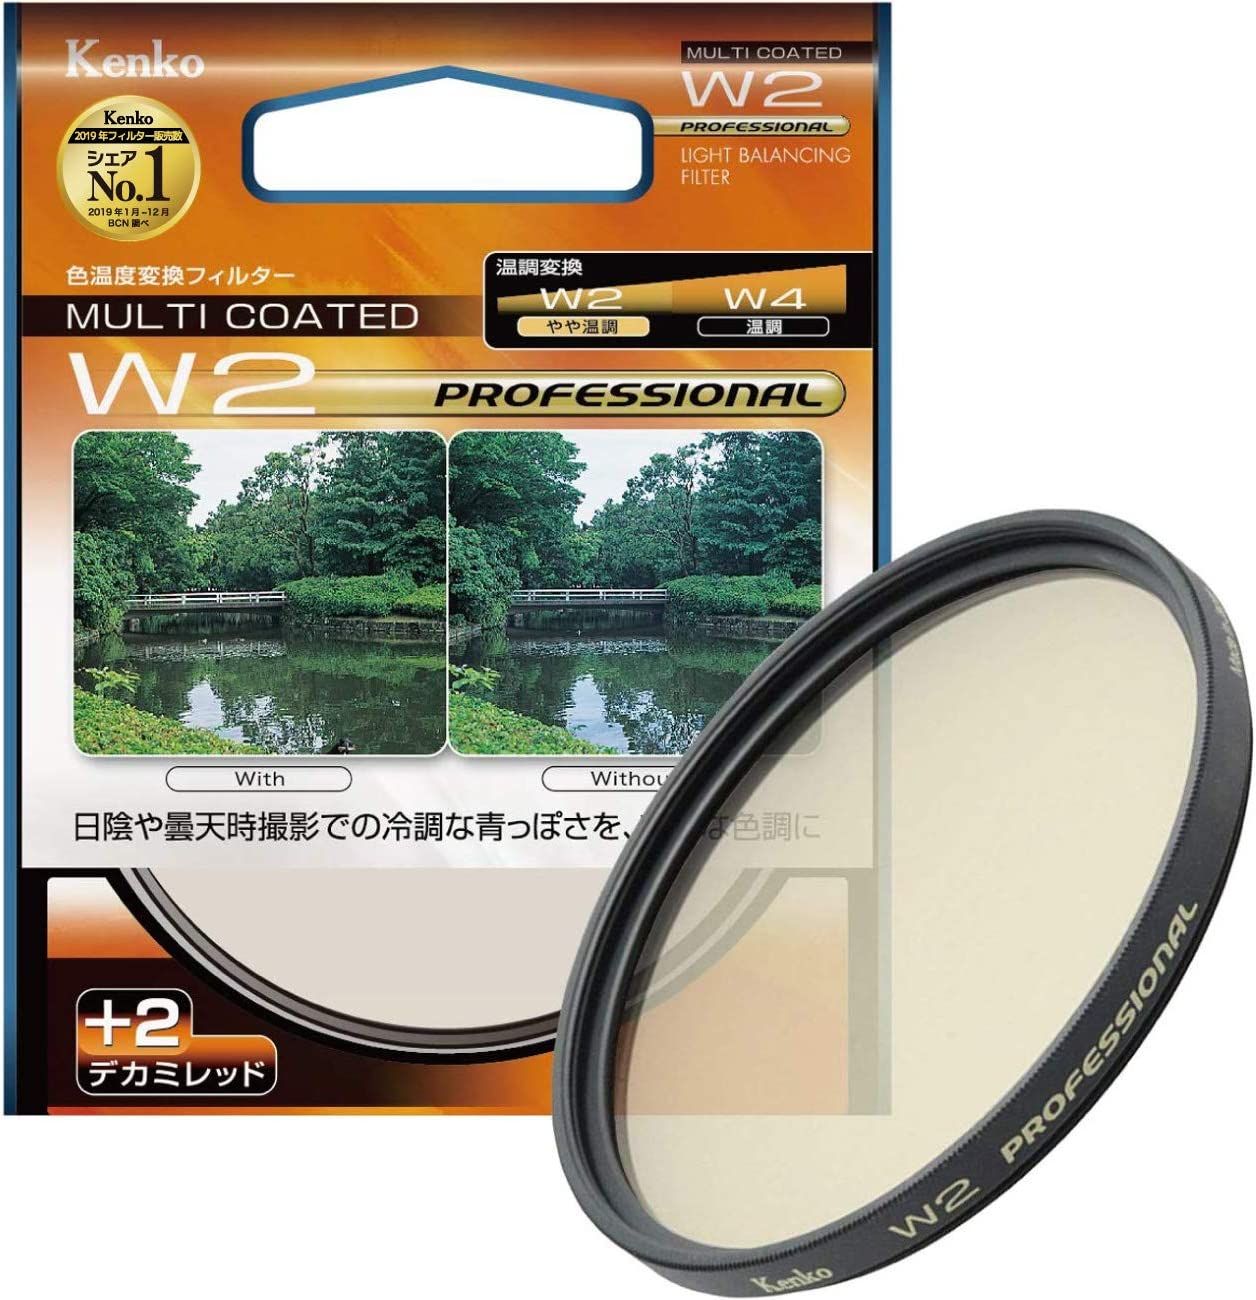 Kenko 52mm C8 Professional Multi-Coated Camera Lens Filters